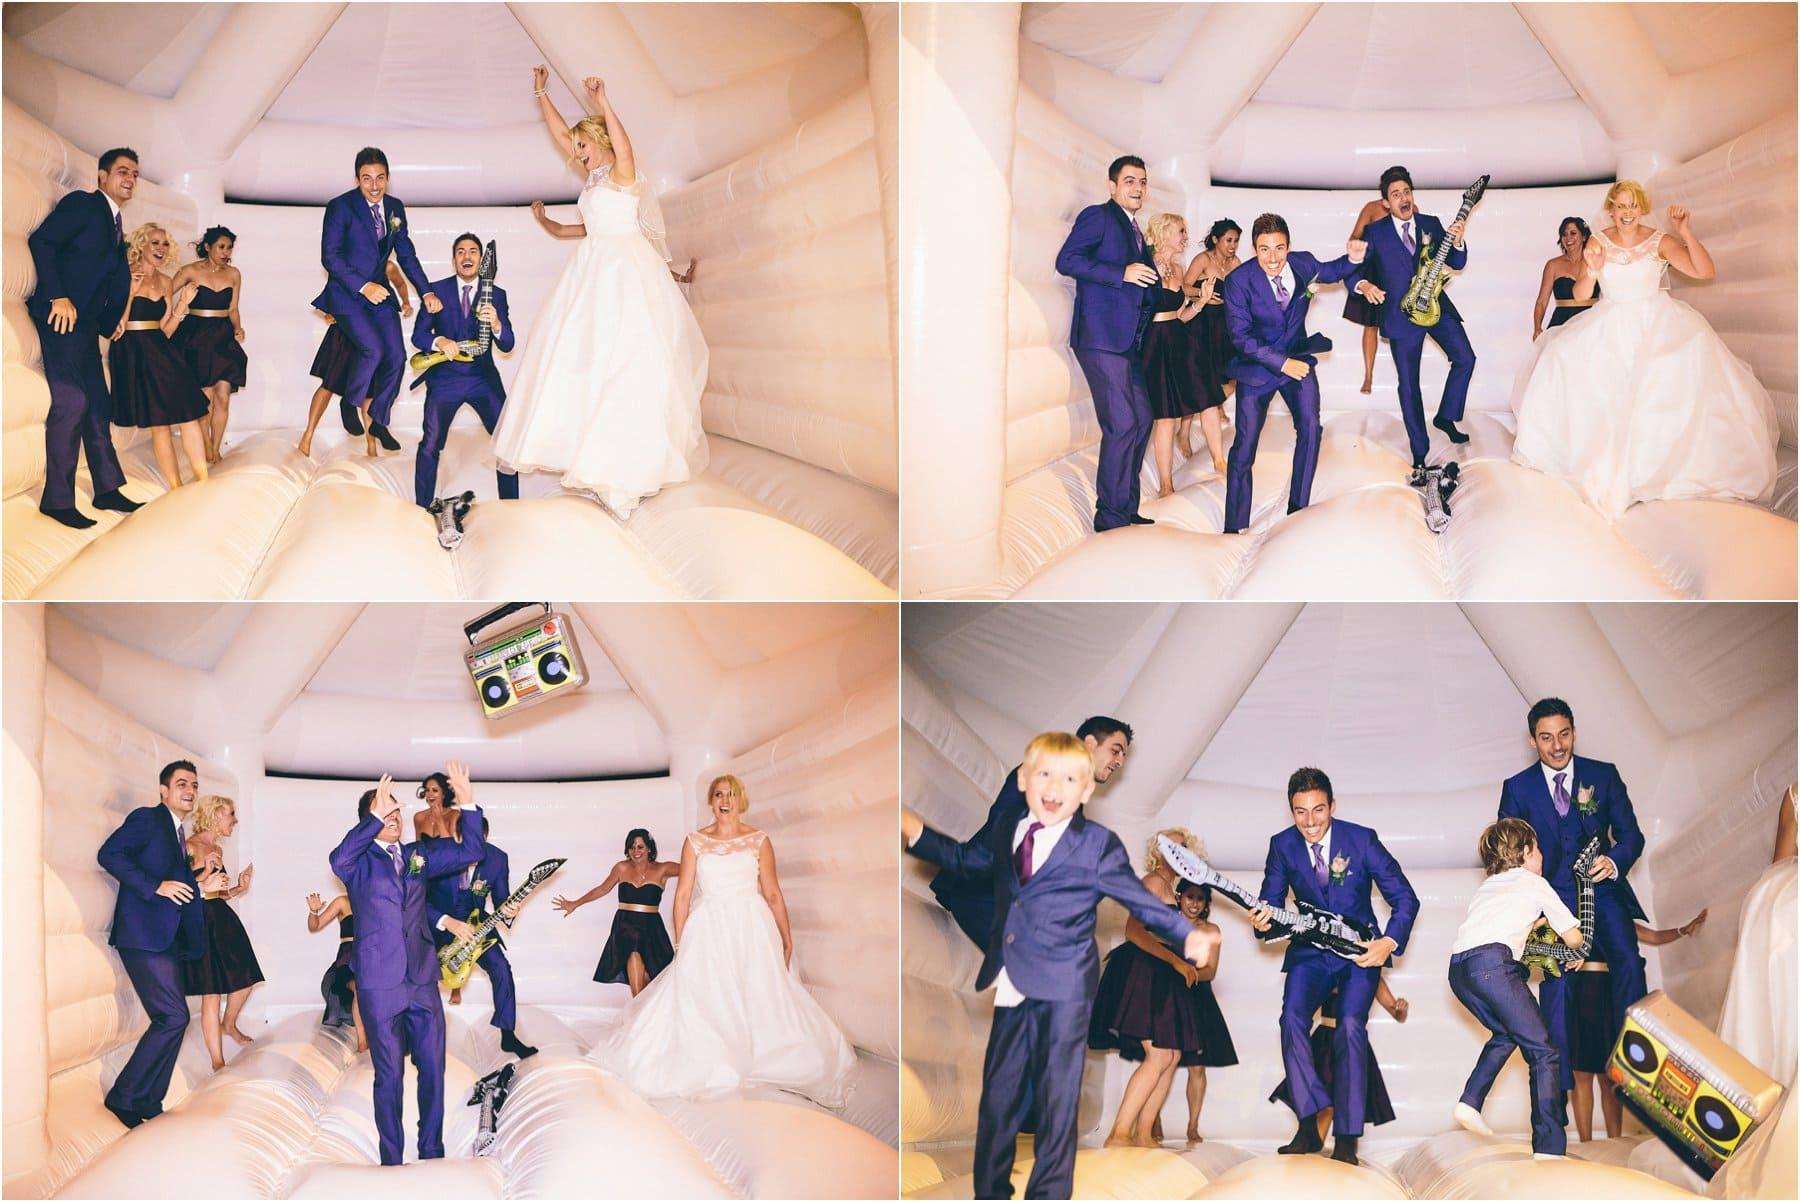 Thornton_Manor_Wedding_Photography_0111